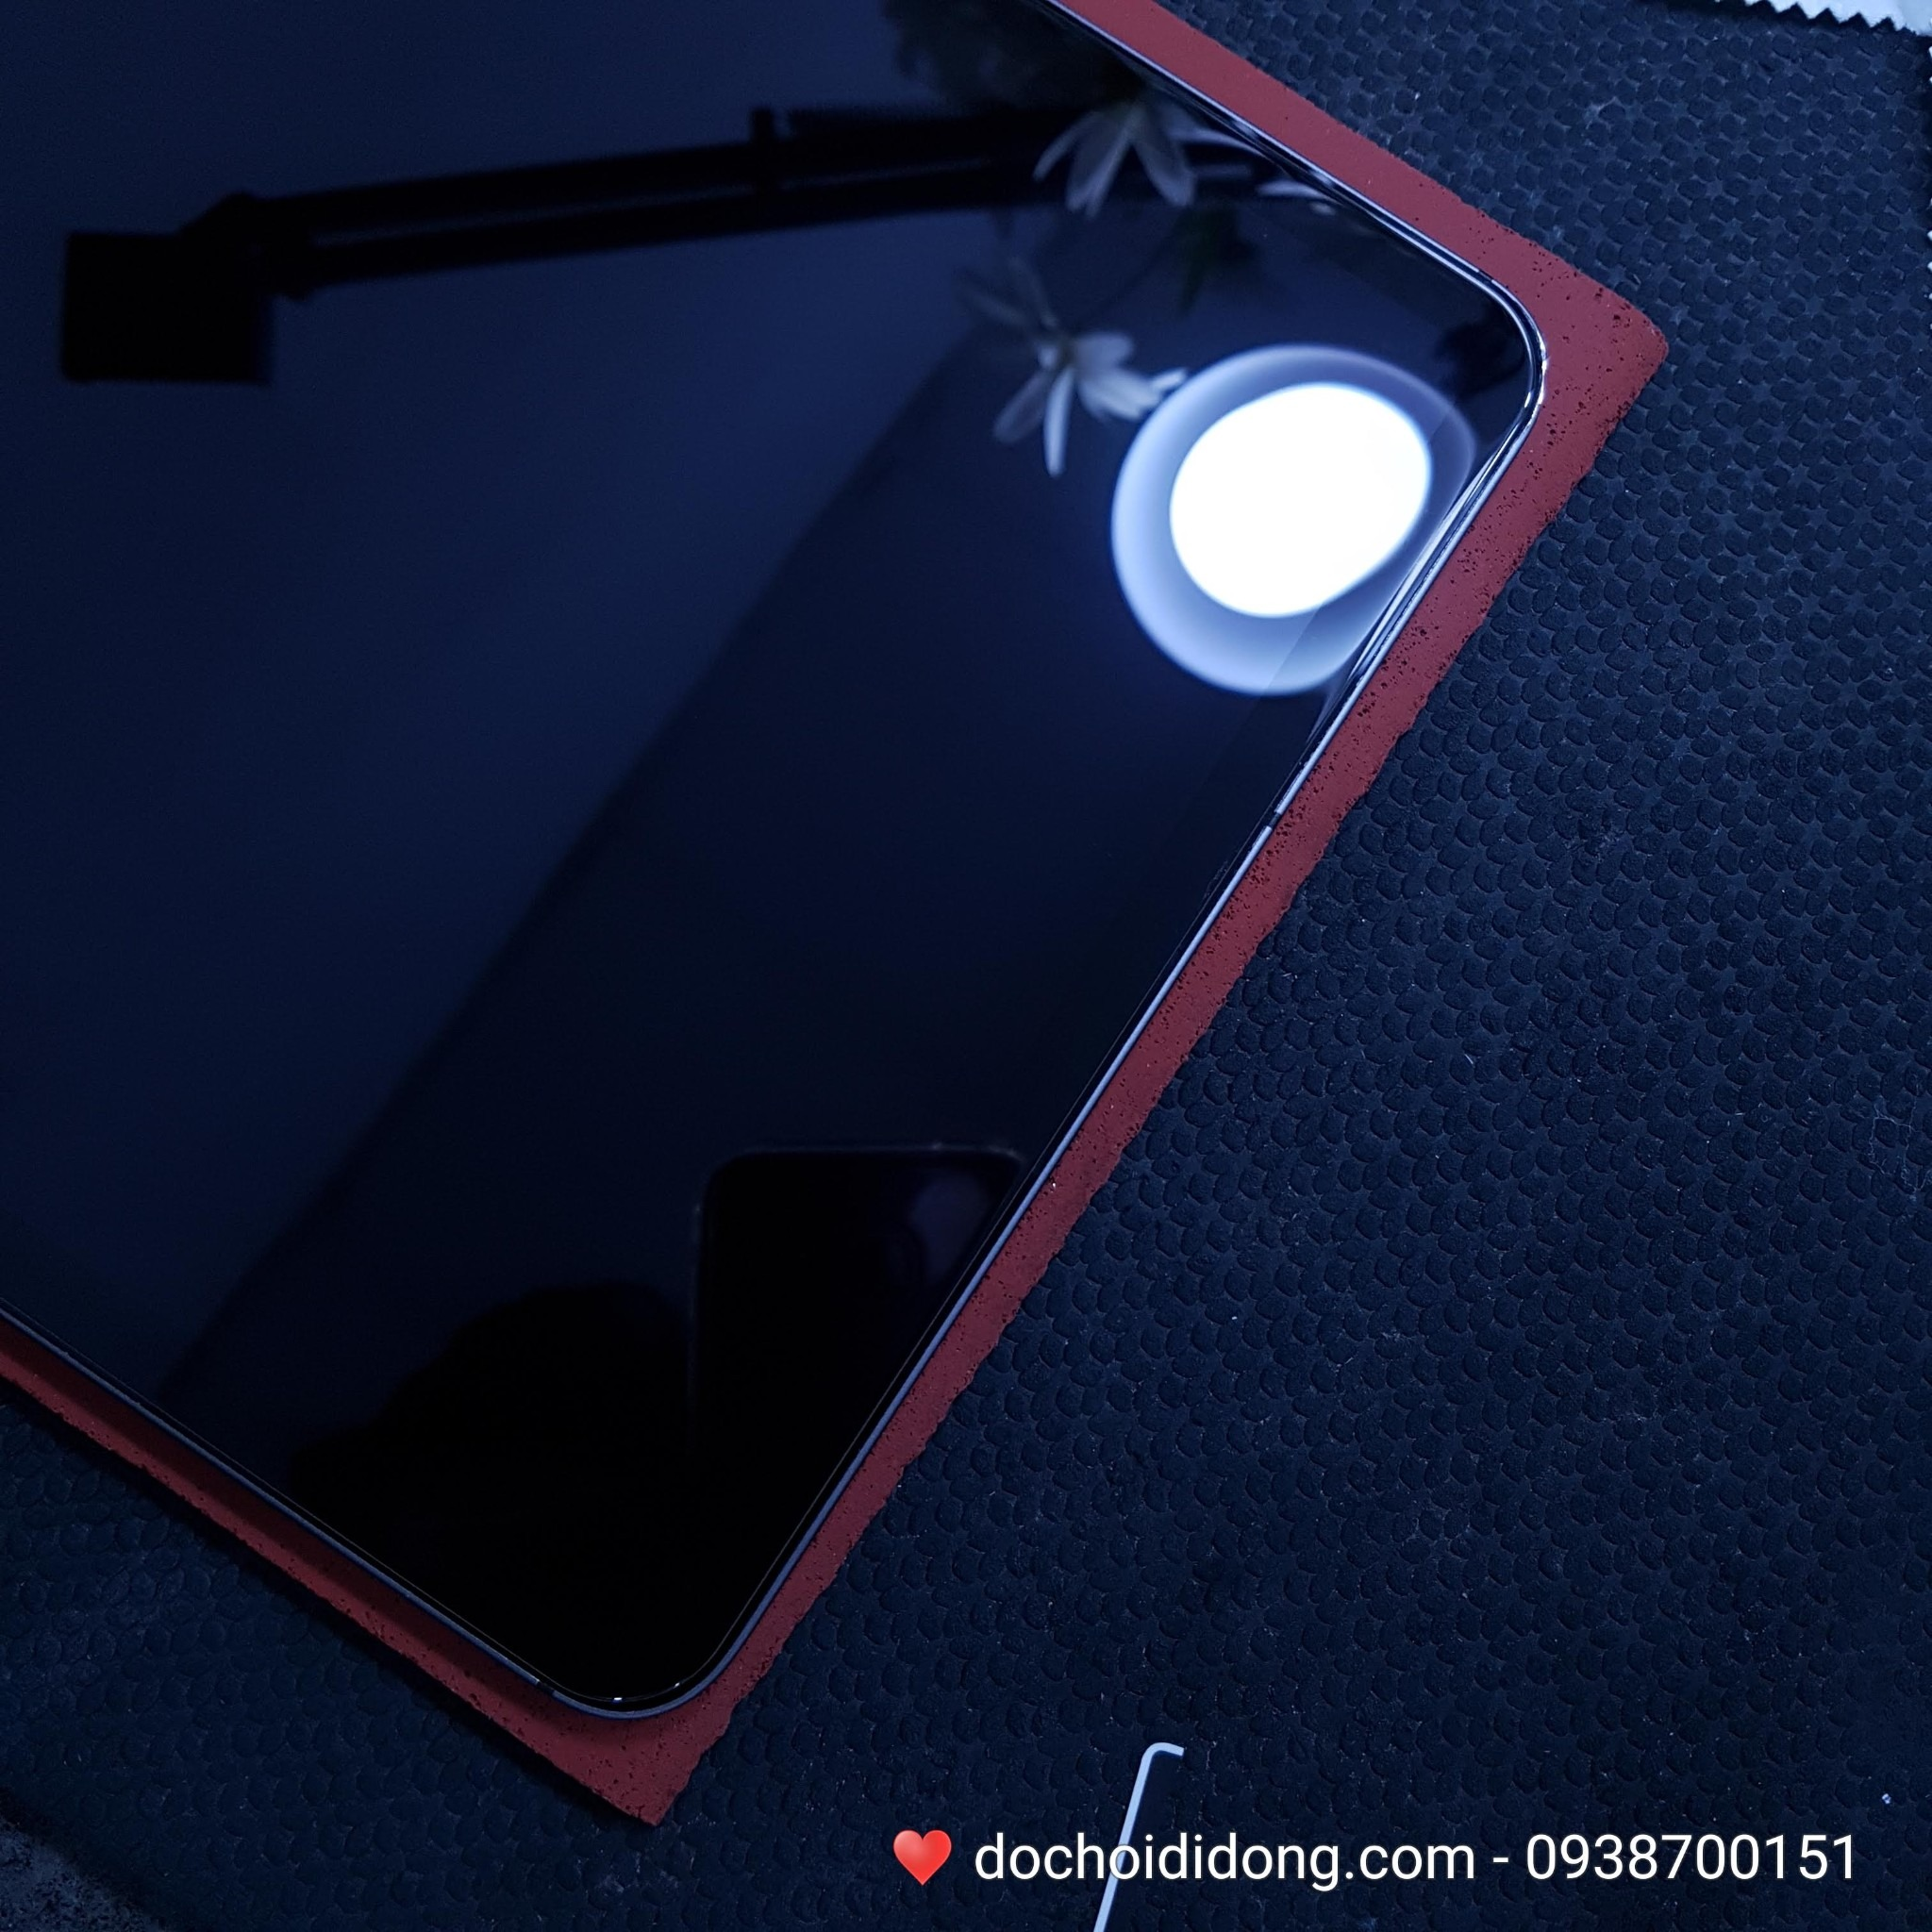 mieng-dan-cuong-luc-ipad-pro-m1-2021-zacase-tablet-premium